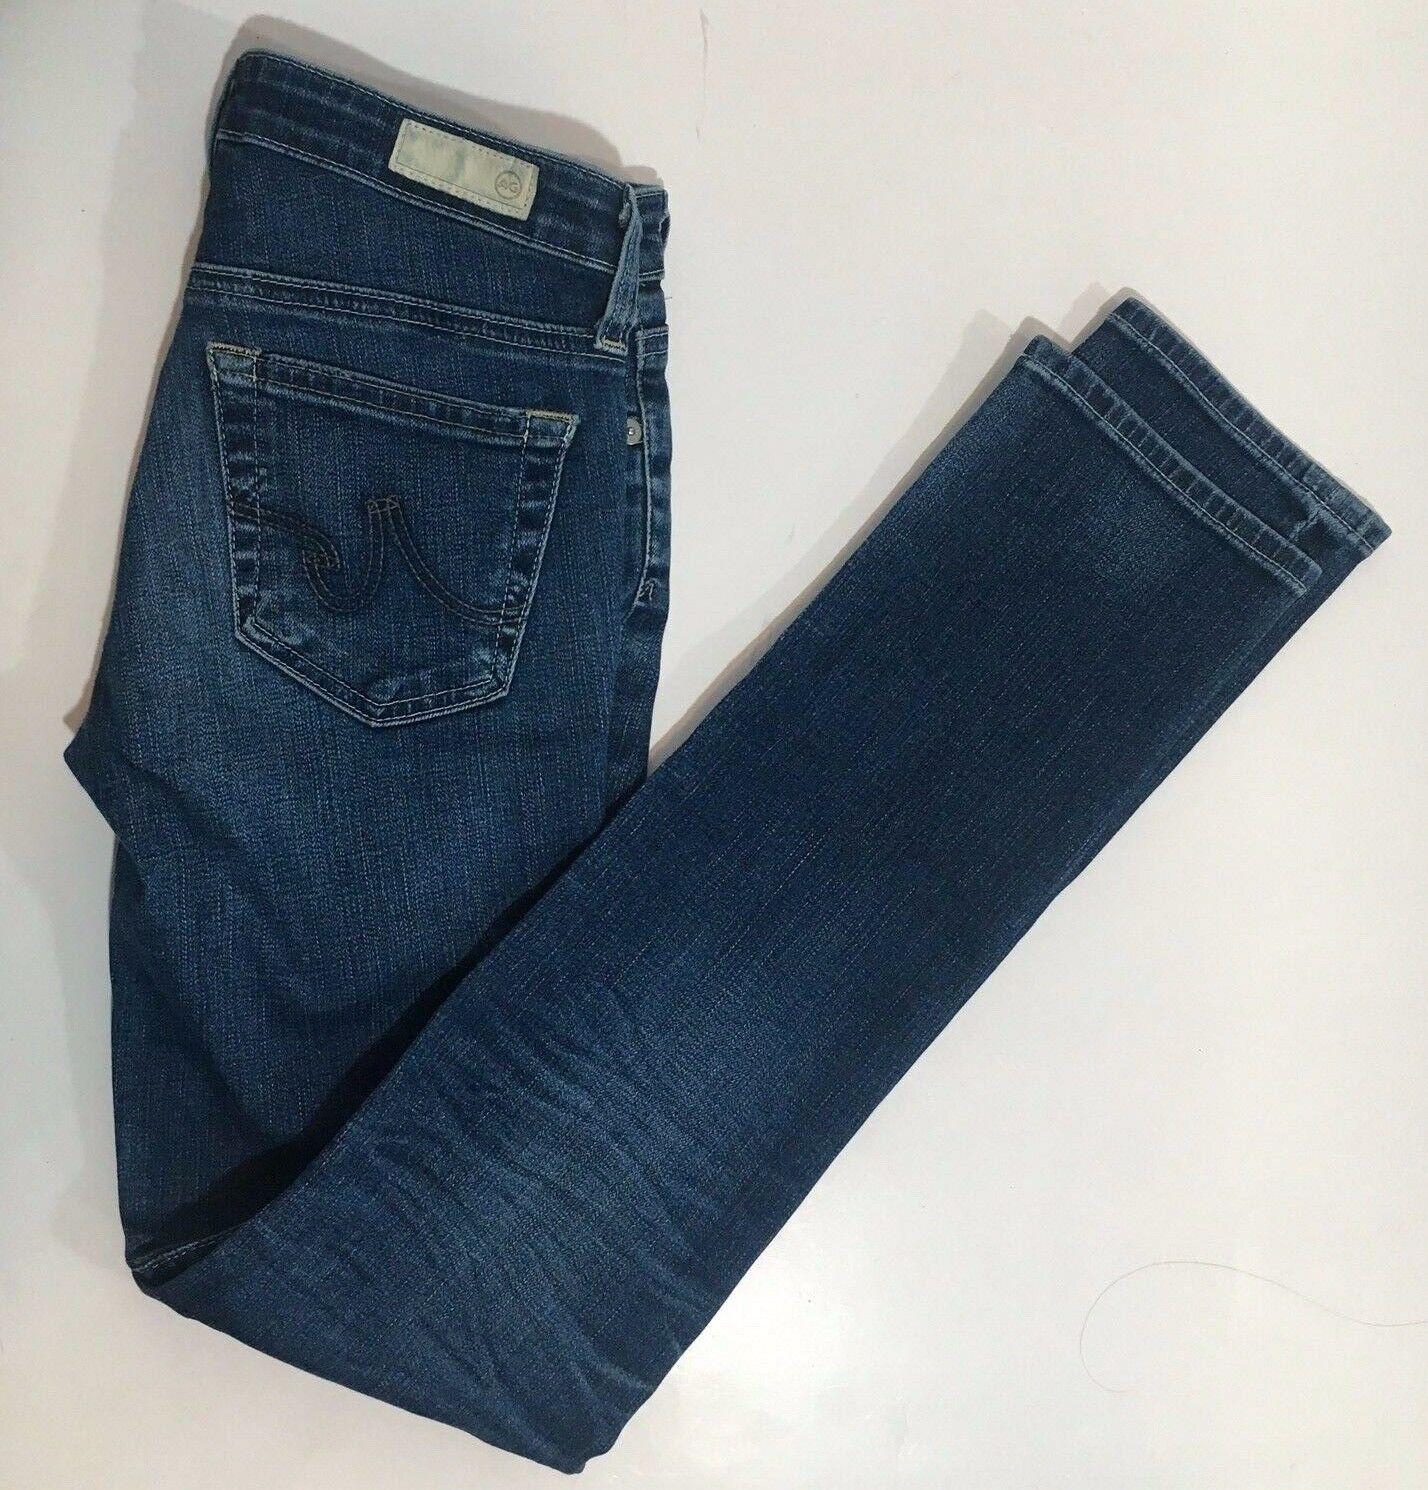 0ce73cbb11a Adriano goldschmied Stilt Leg Womens size 24 x 28 Cigarette Jeans  qelgmv1657-Jeans